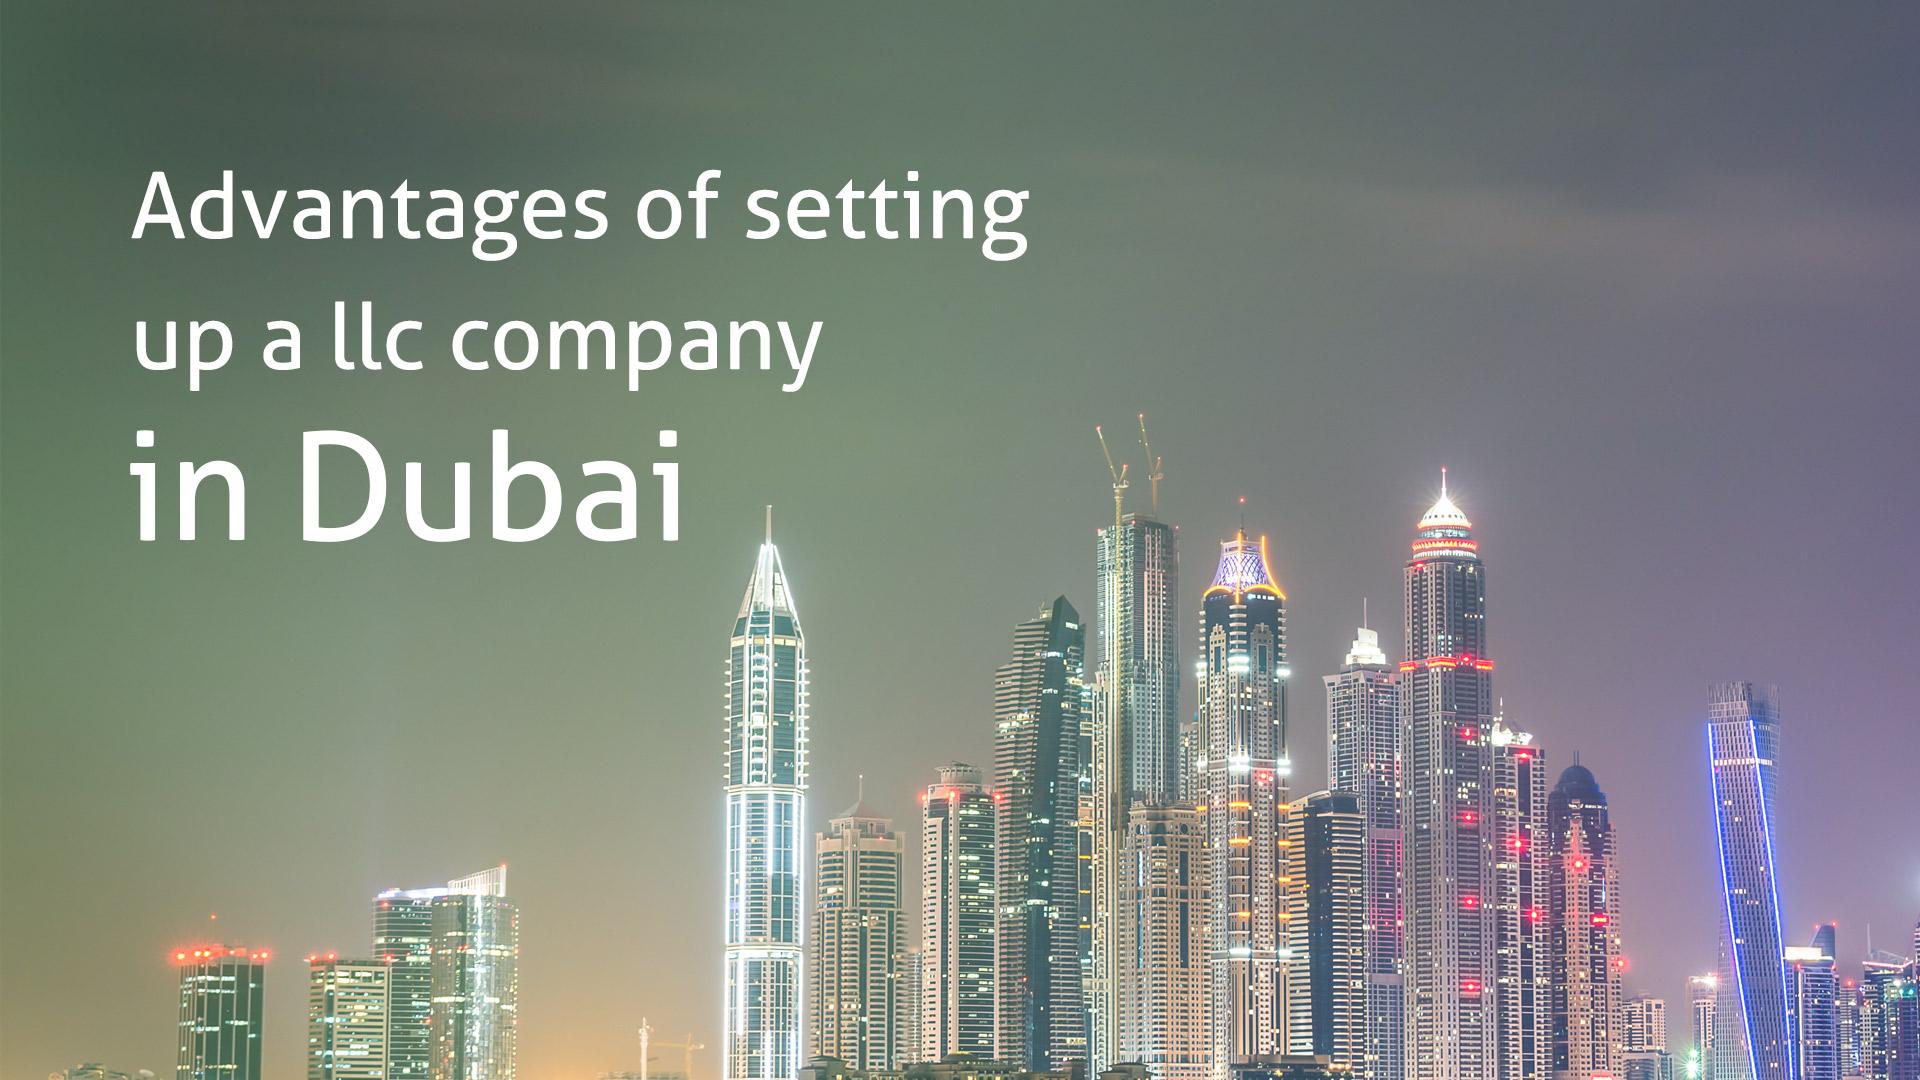 Advantages of setting up a llc company in Dubai